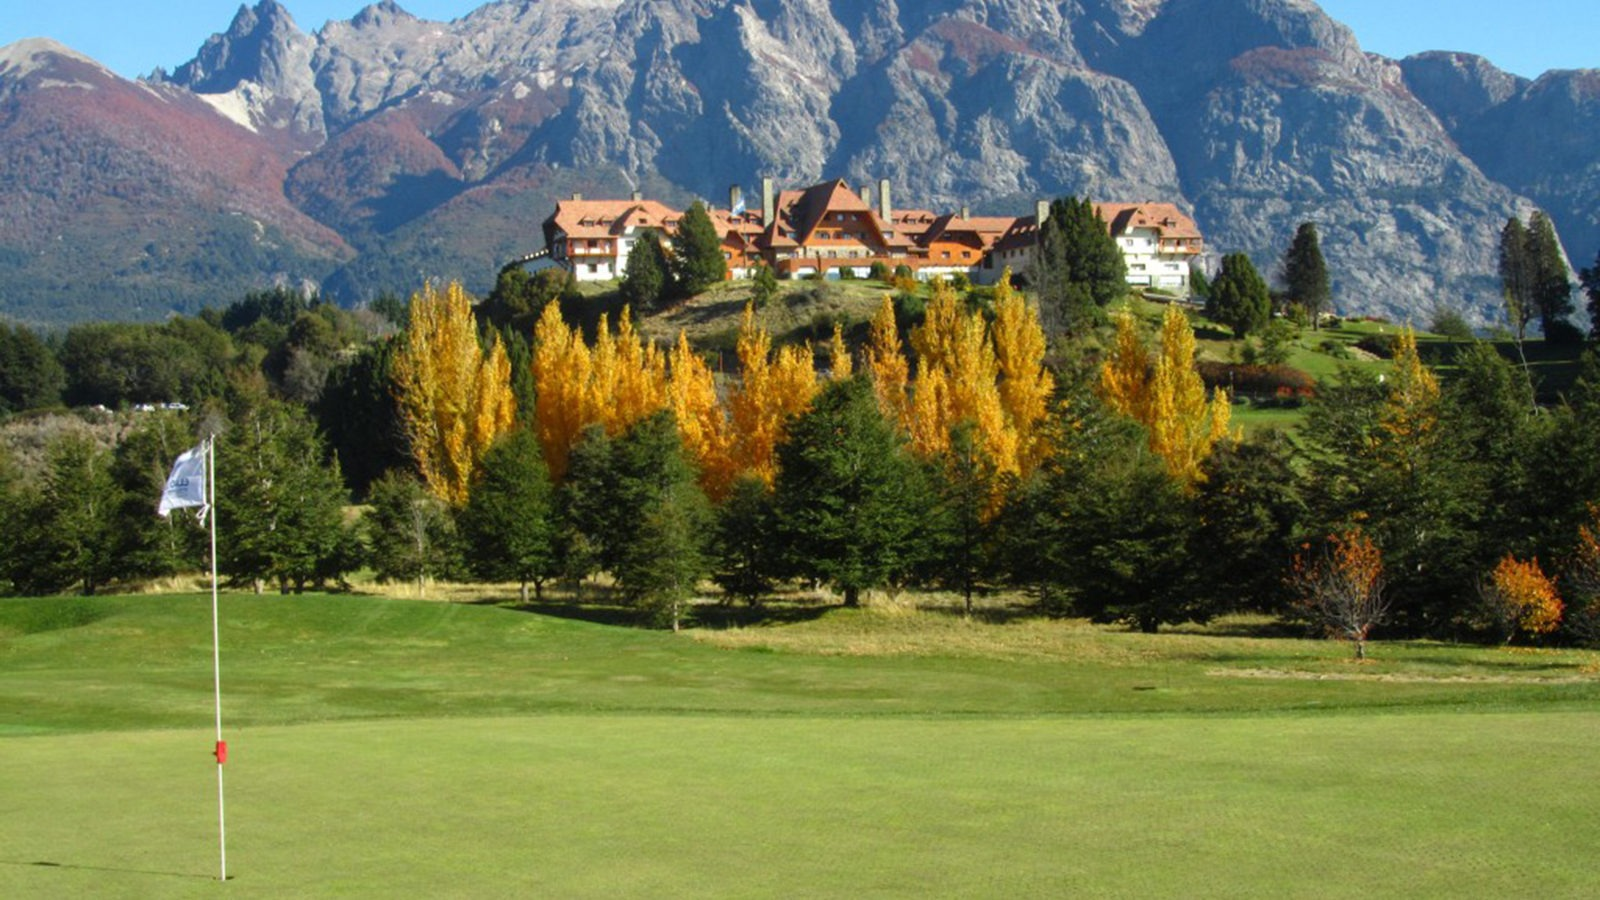 Buenos Aires Patagonia Golf-Argentina golf-Llao Llao Golf Club Patagonia